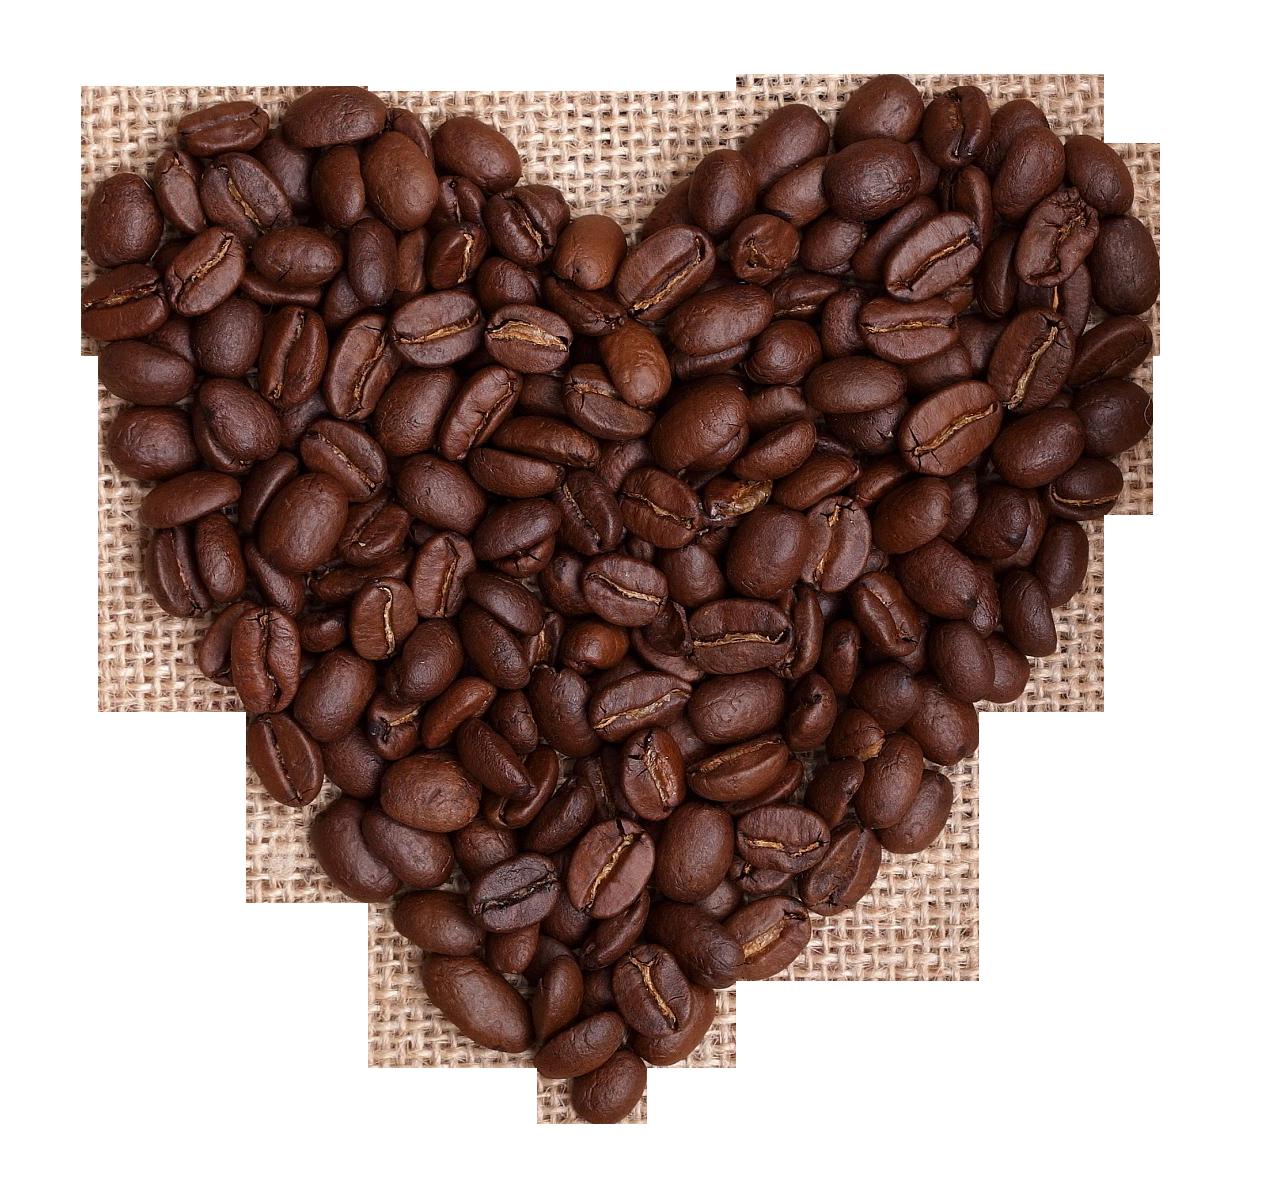 Coffee beans png image. Grains clipart bean